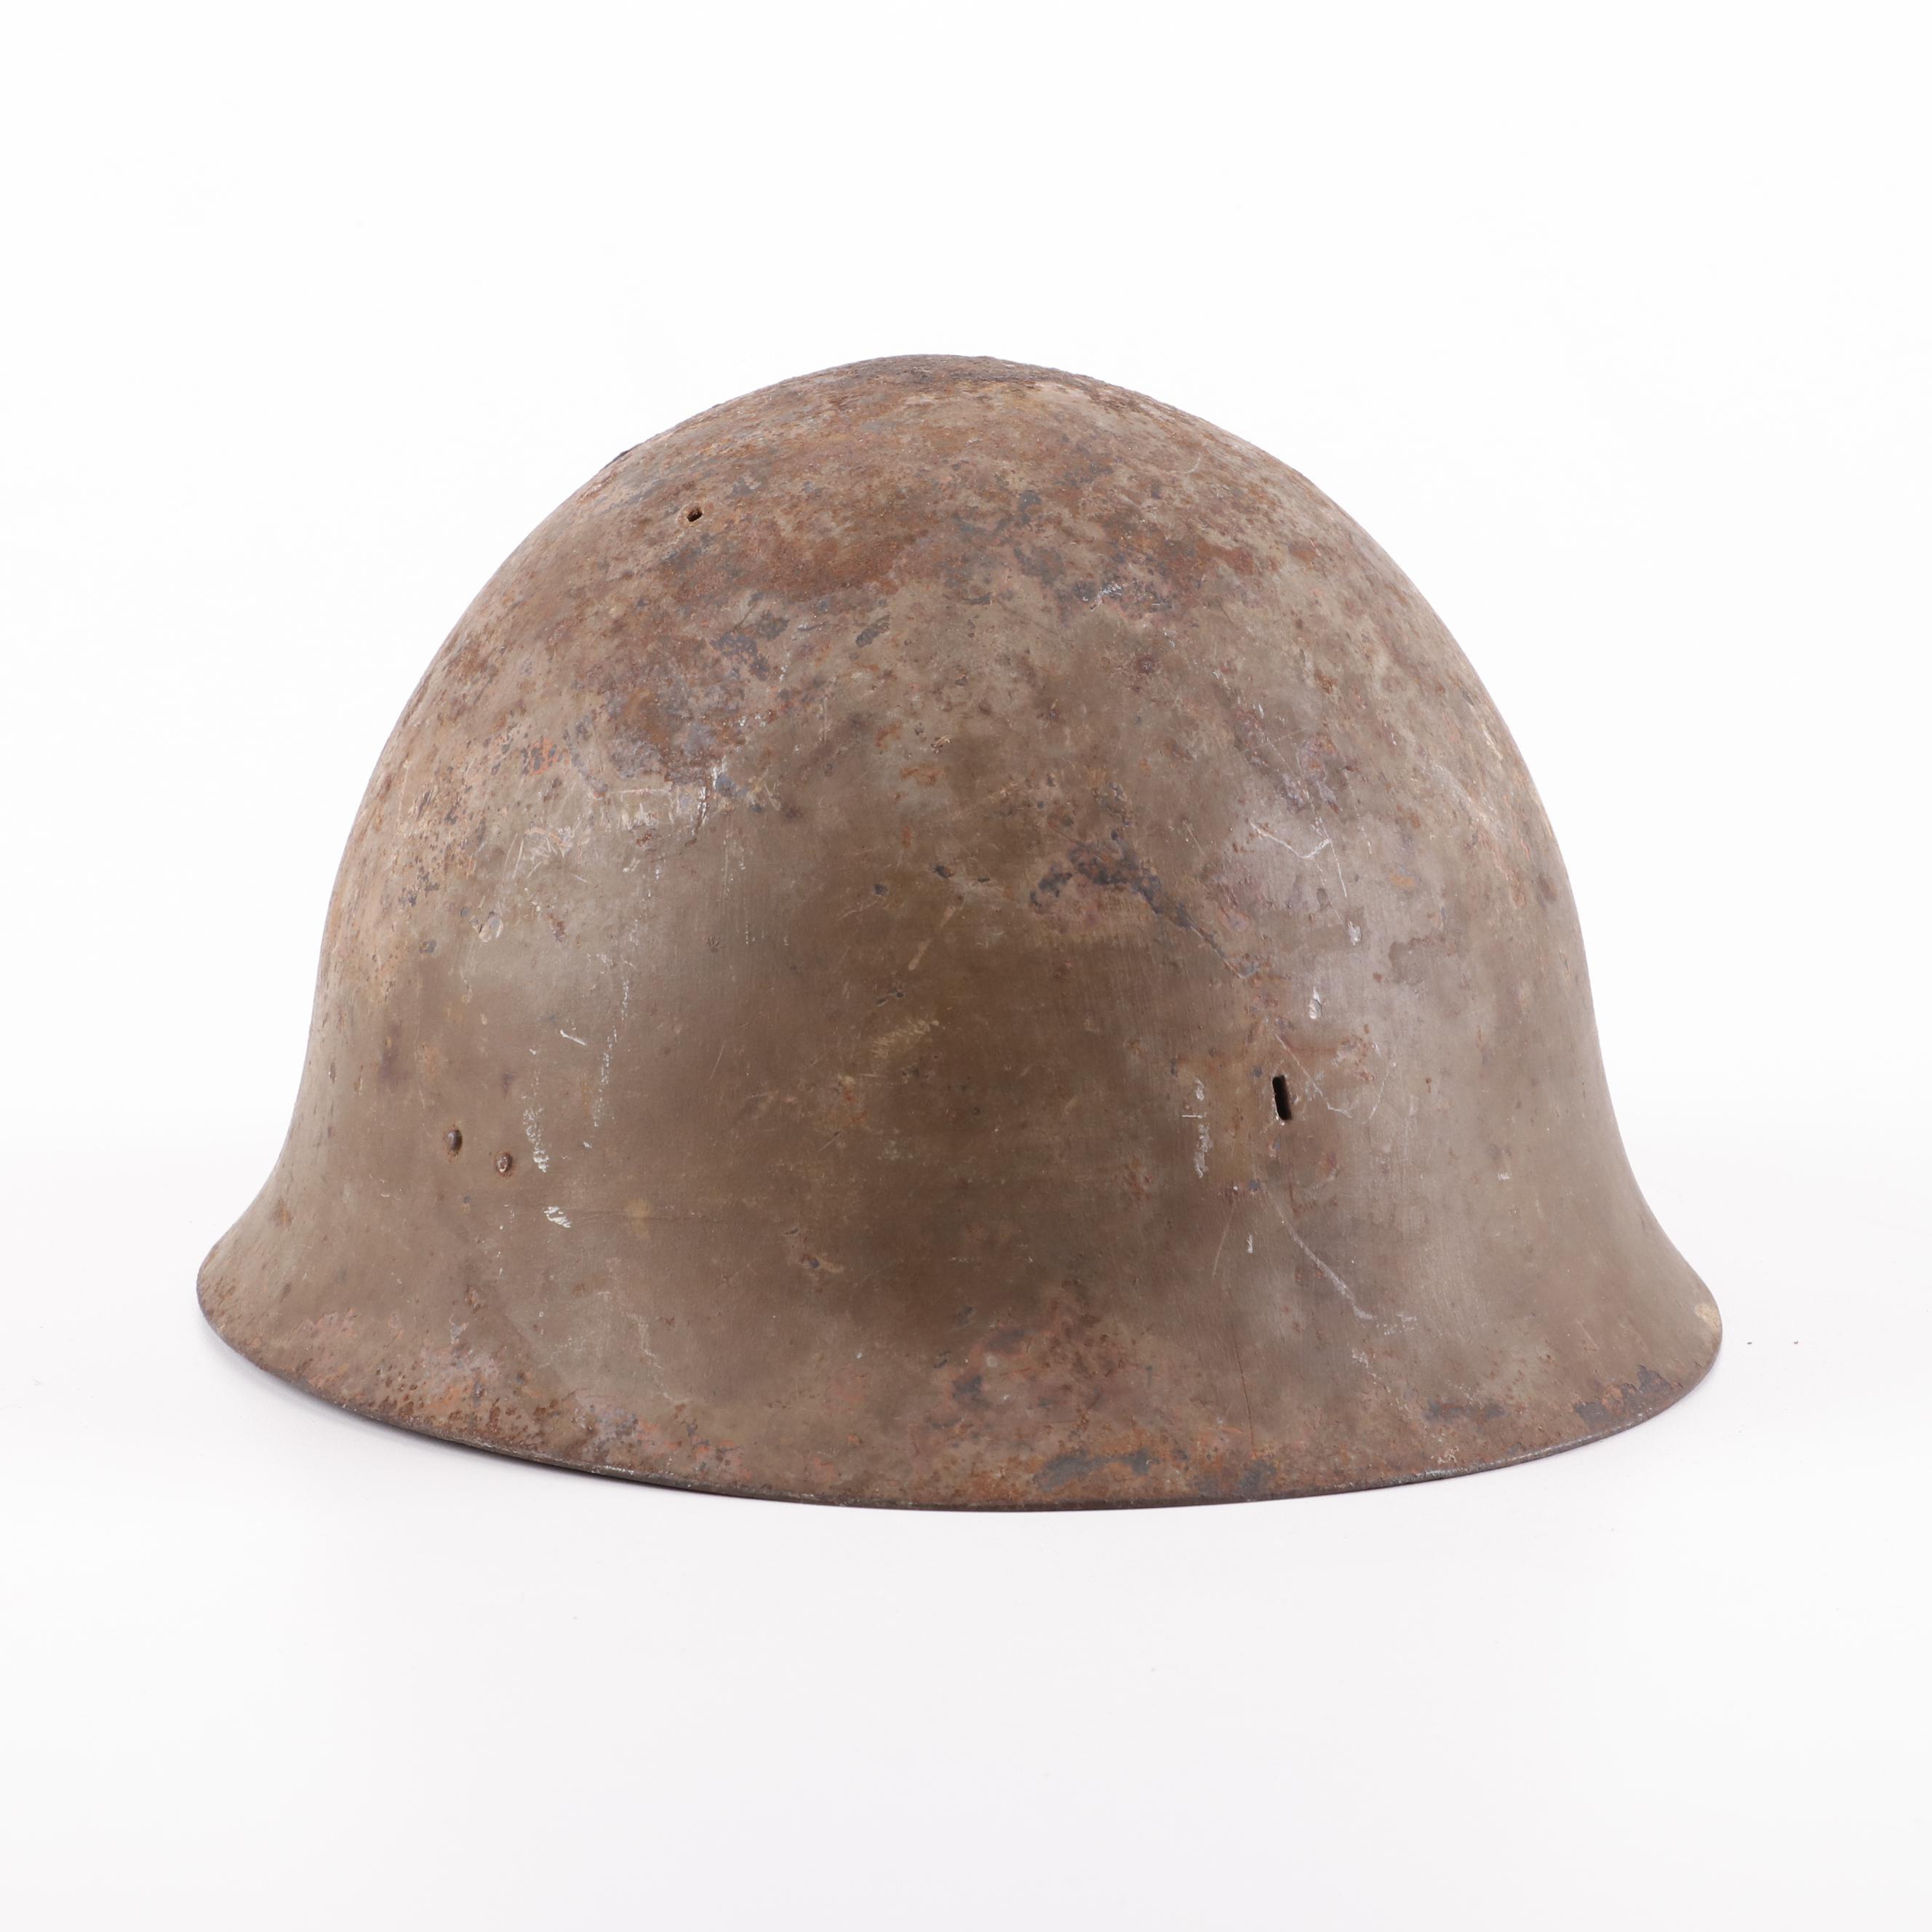 World War II Era Imperial Japanese Army Helmet